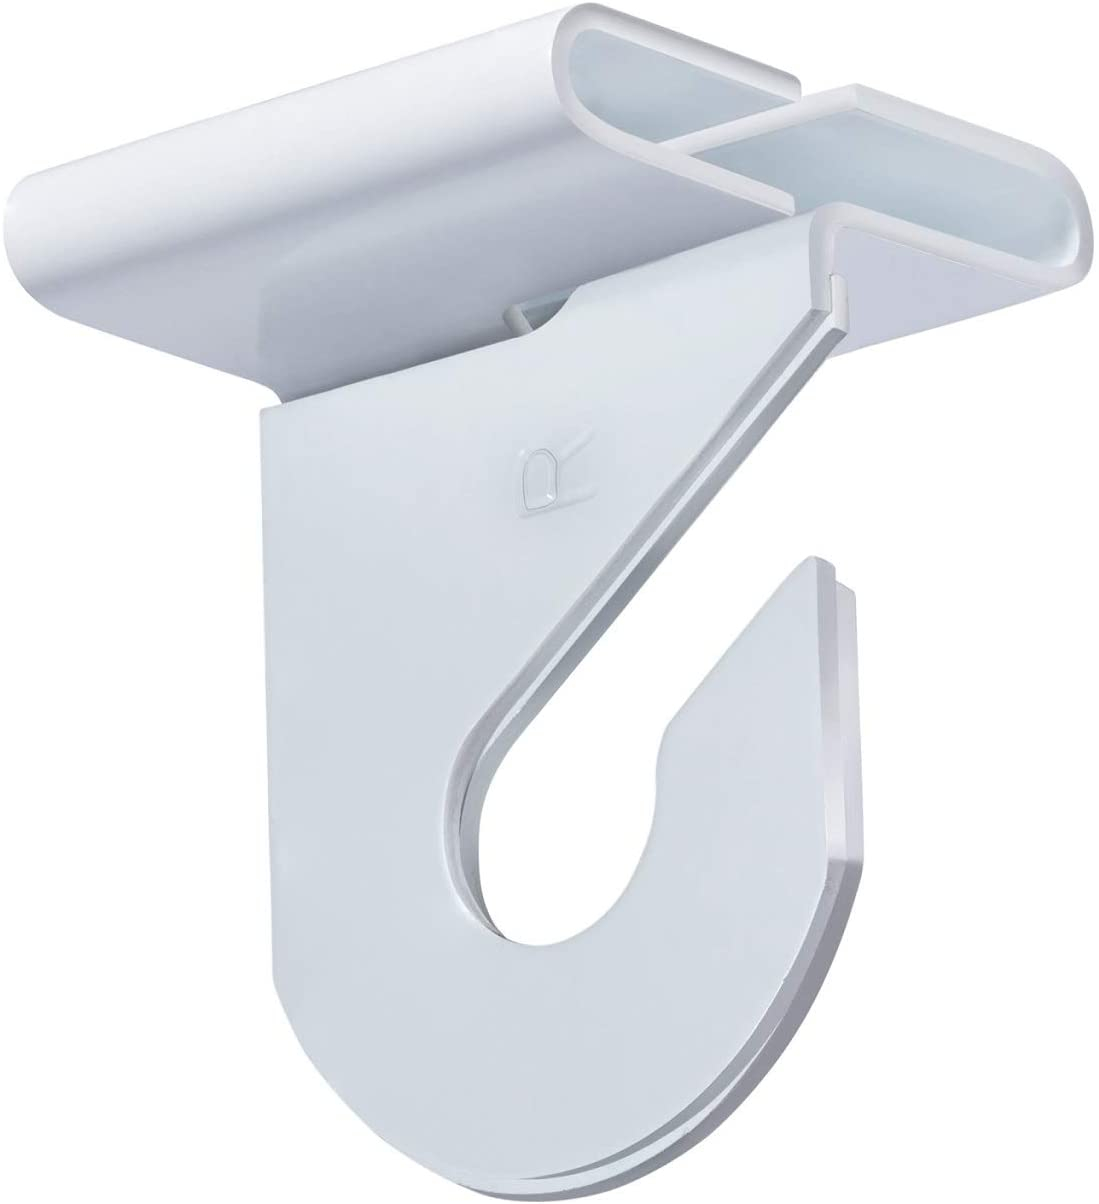 Metal T-Bar Slide Clamp for Drop Ceilings